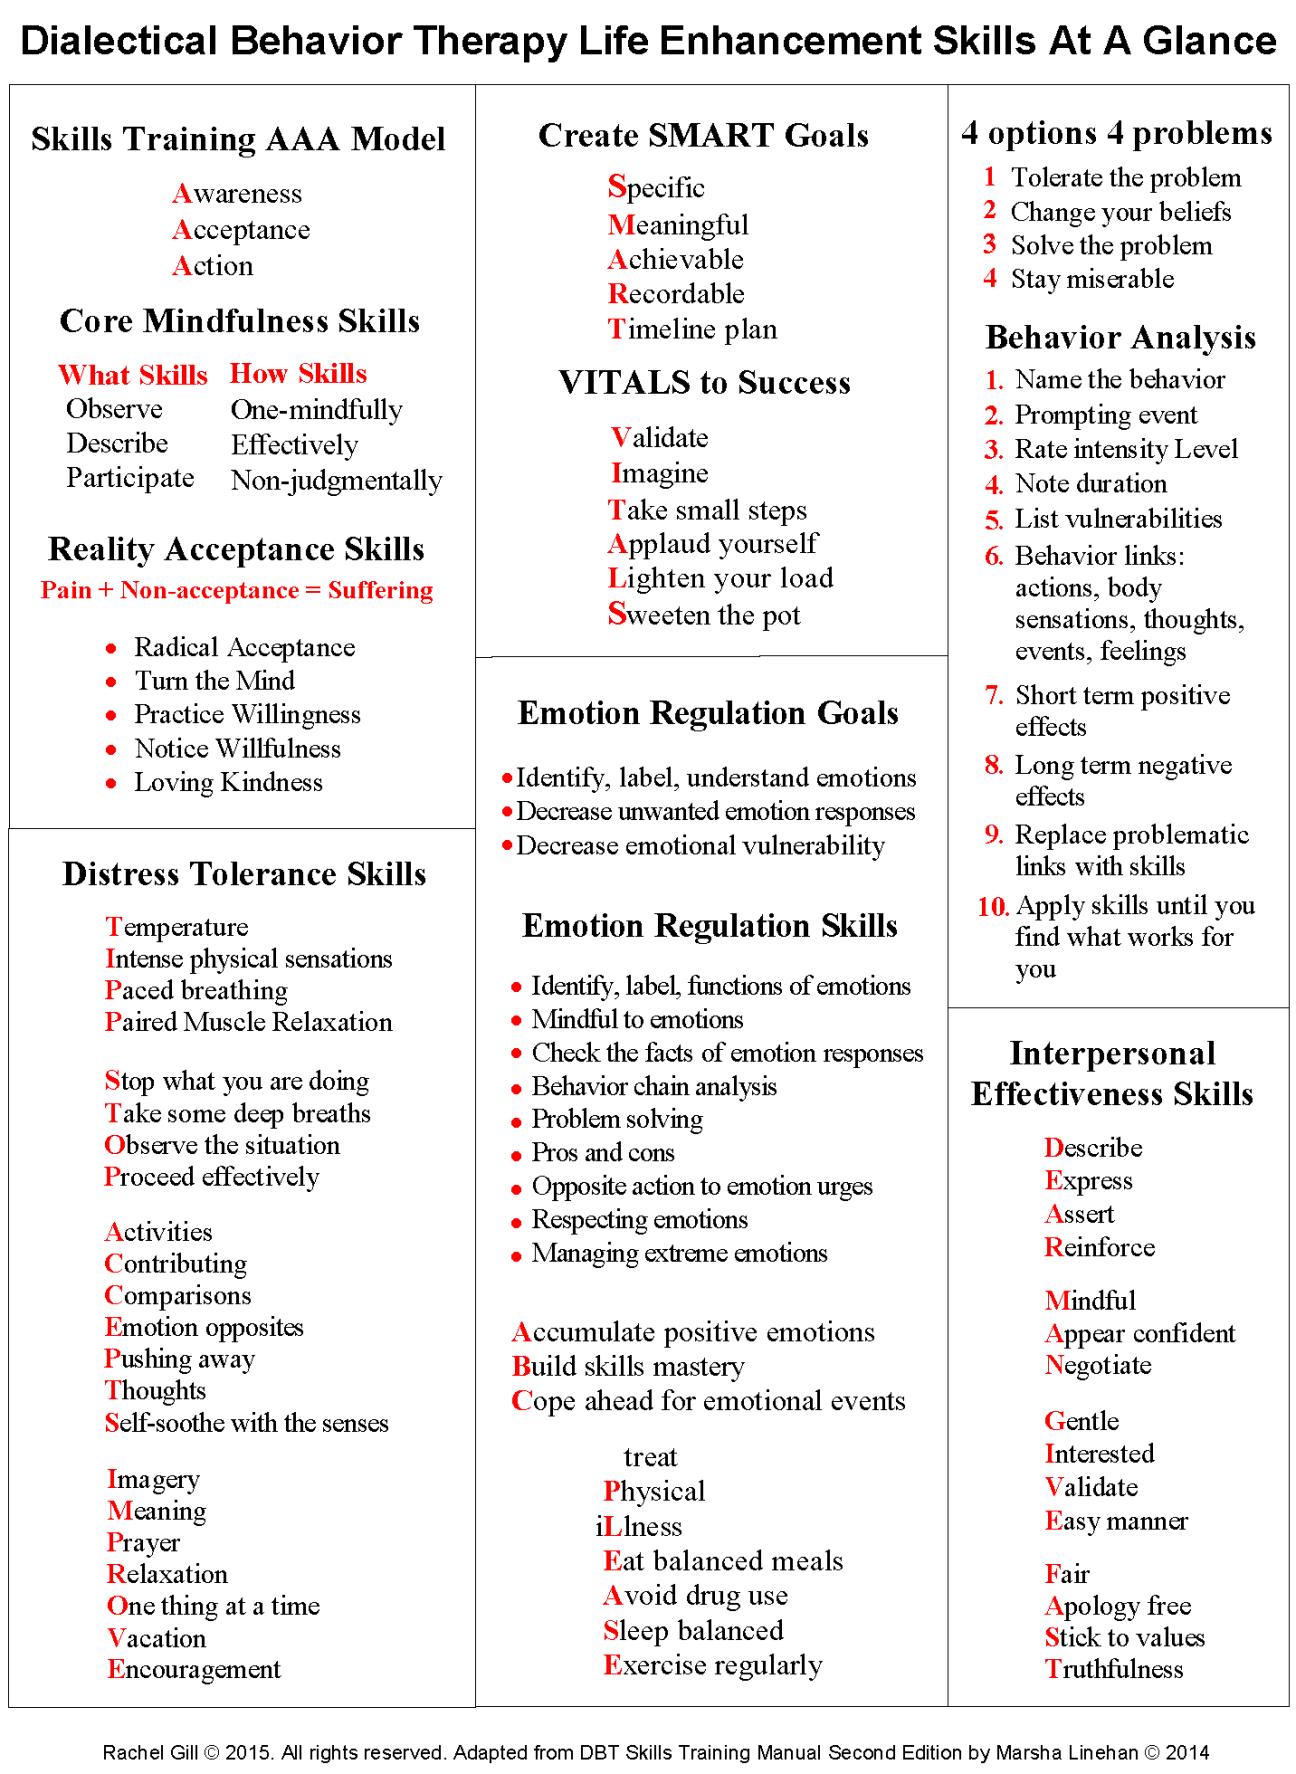 Dbt Handouts & Worksheets | Dbt Peer Connections | Self Study - Free | Free Printable Coping Skills Worksheets